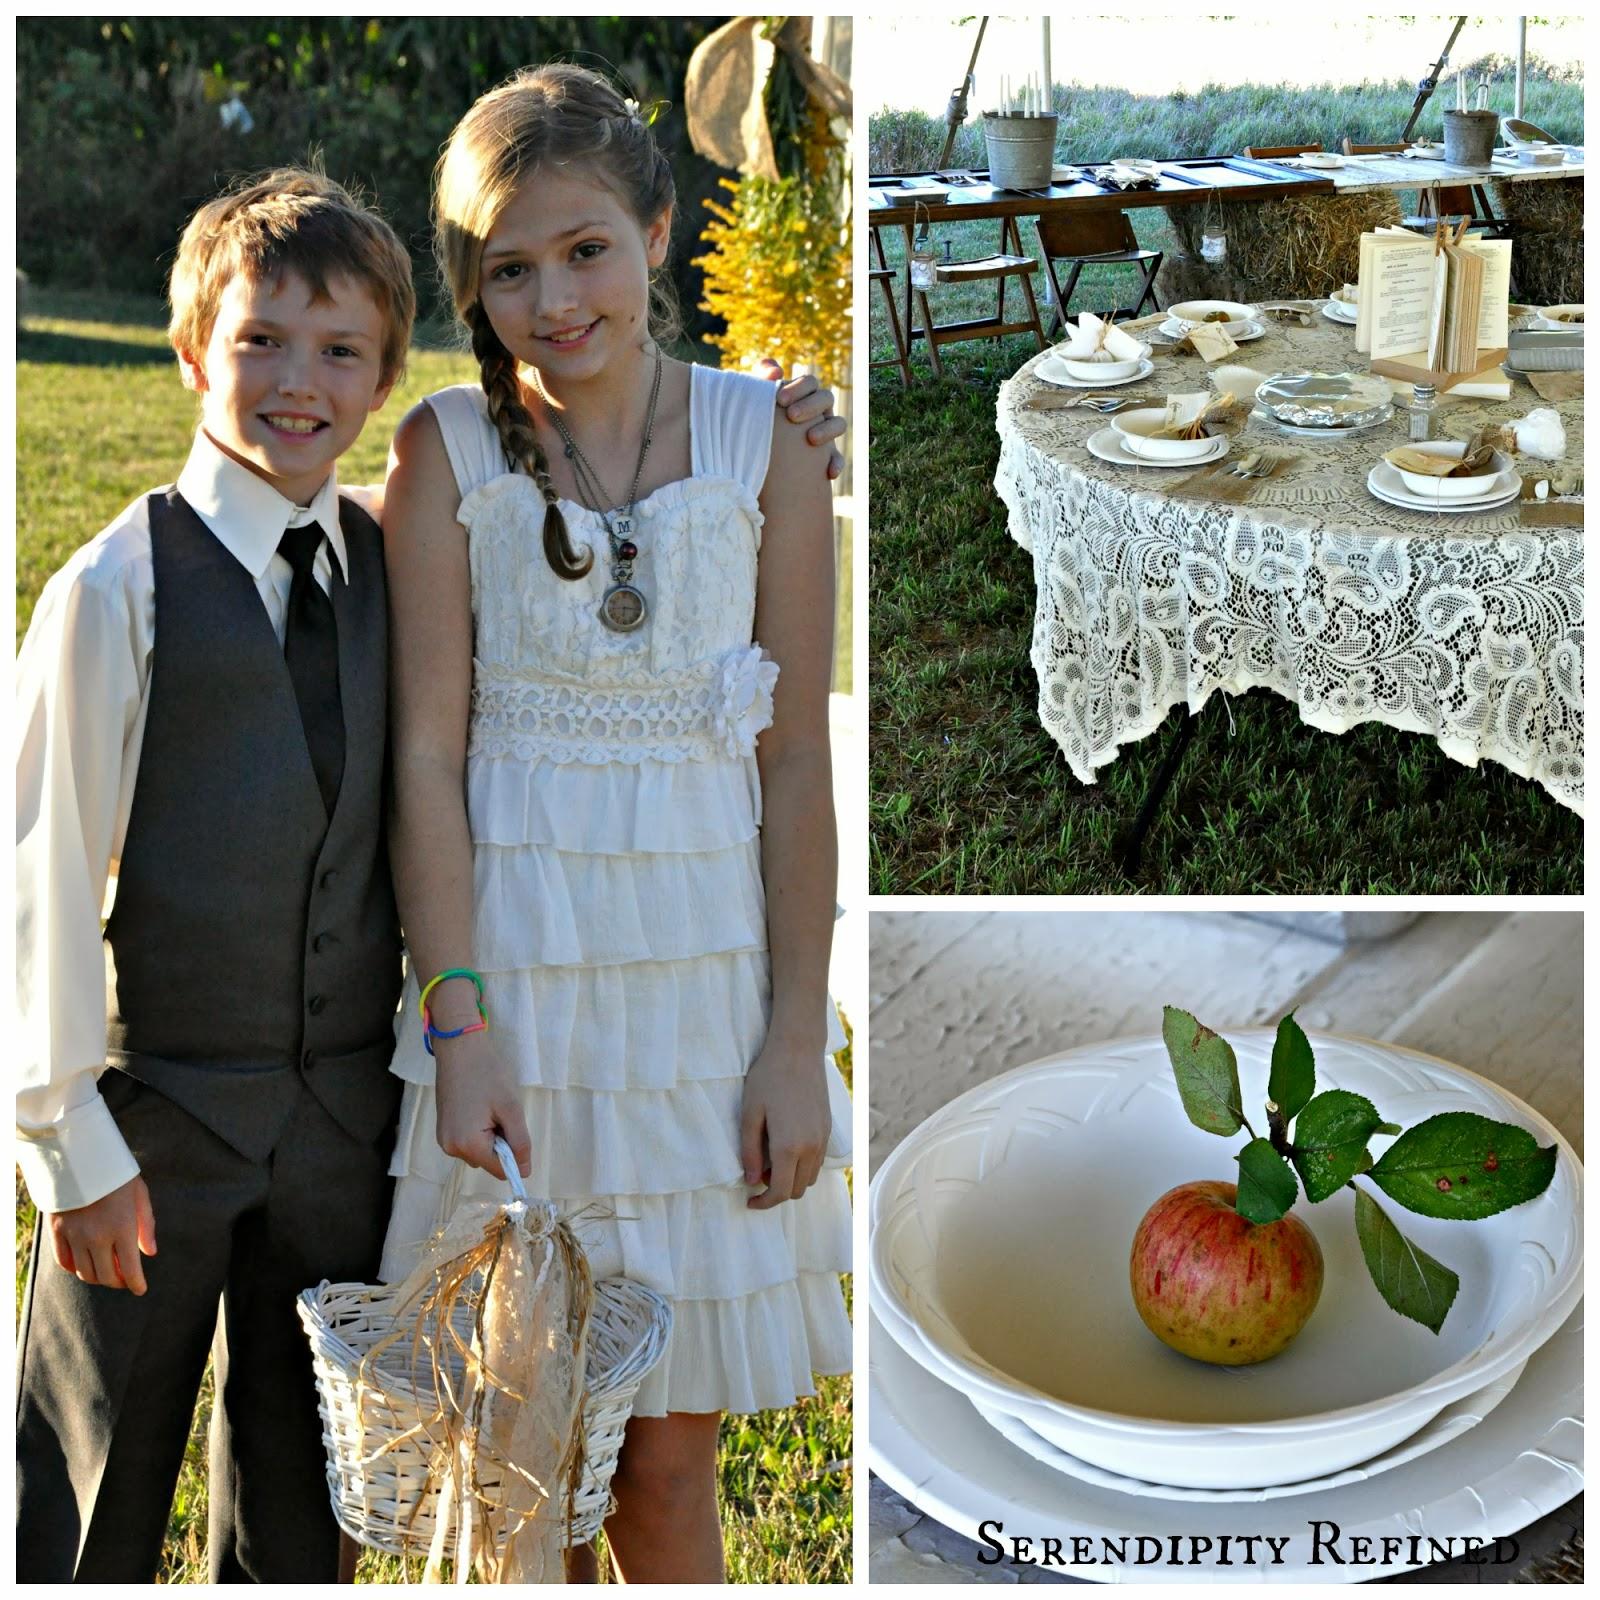 Serendipity Refined Blog: Vintage Farm Style Wedding